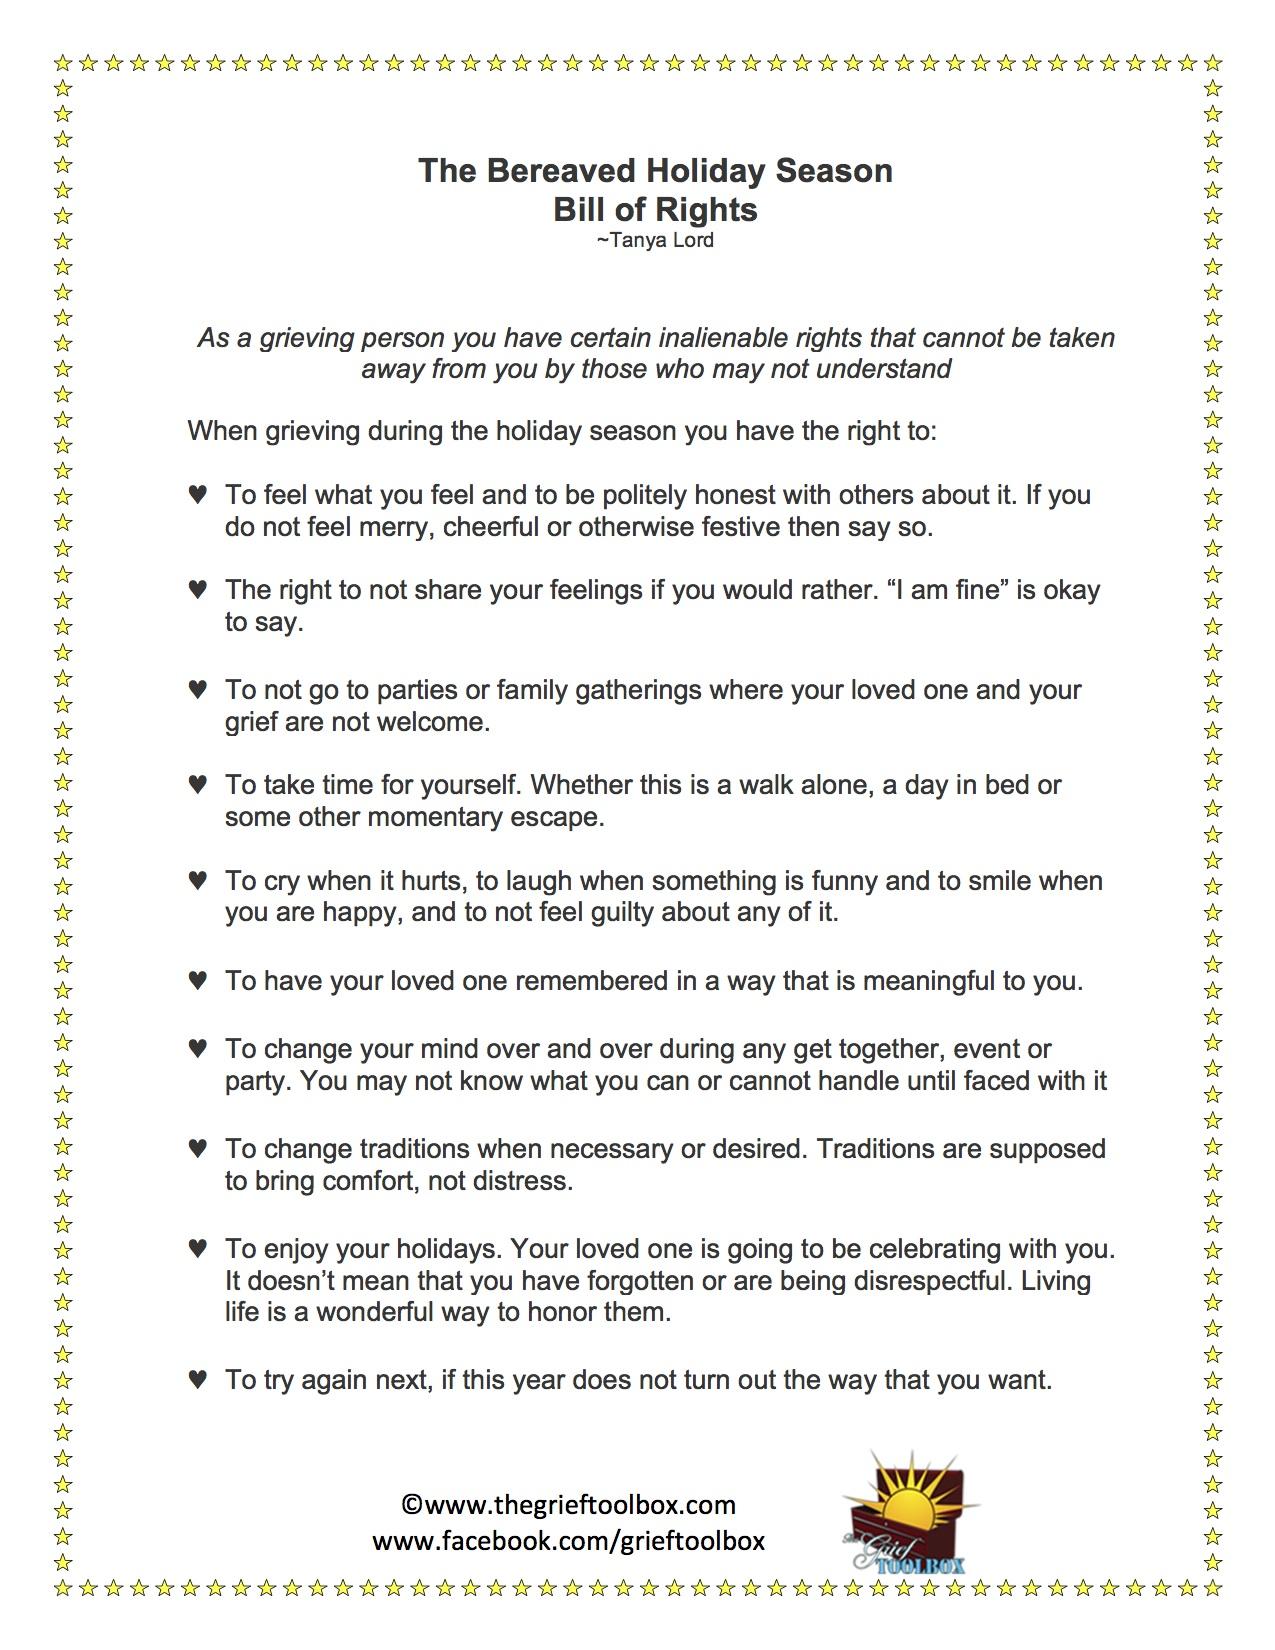 The Bereaved Holiday Season Bill Of Rights